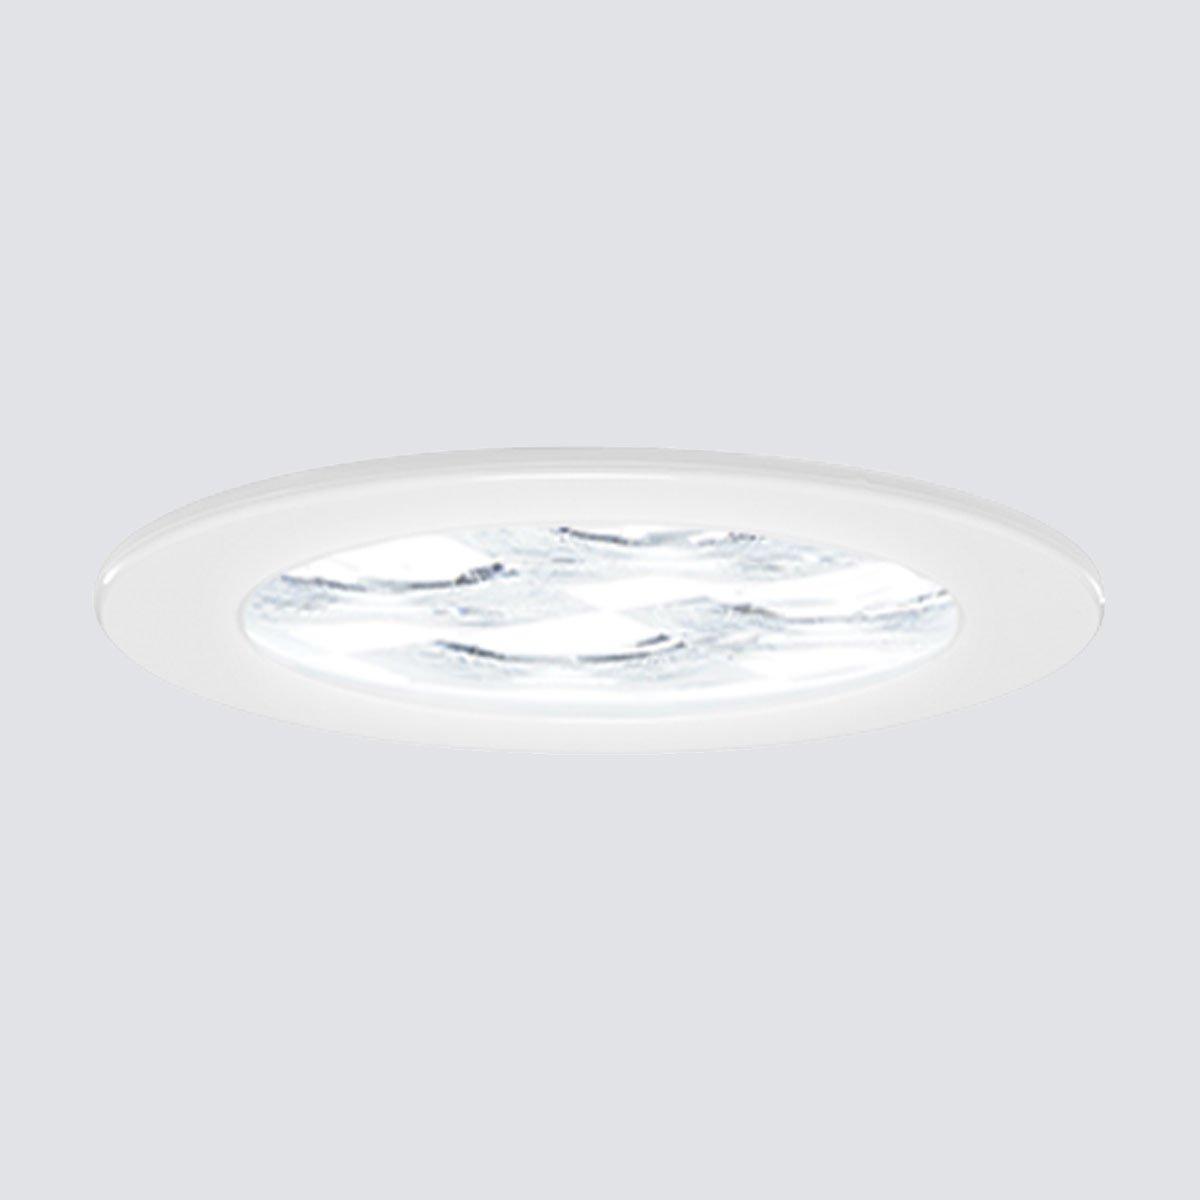 Classic Optiview Kruhovy Difuzor Pre Svetlovod